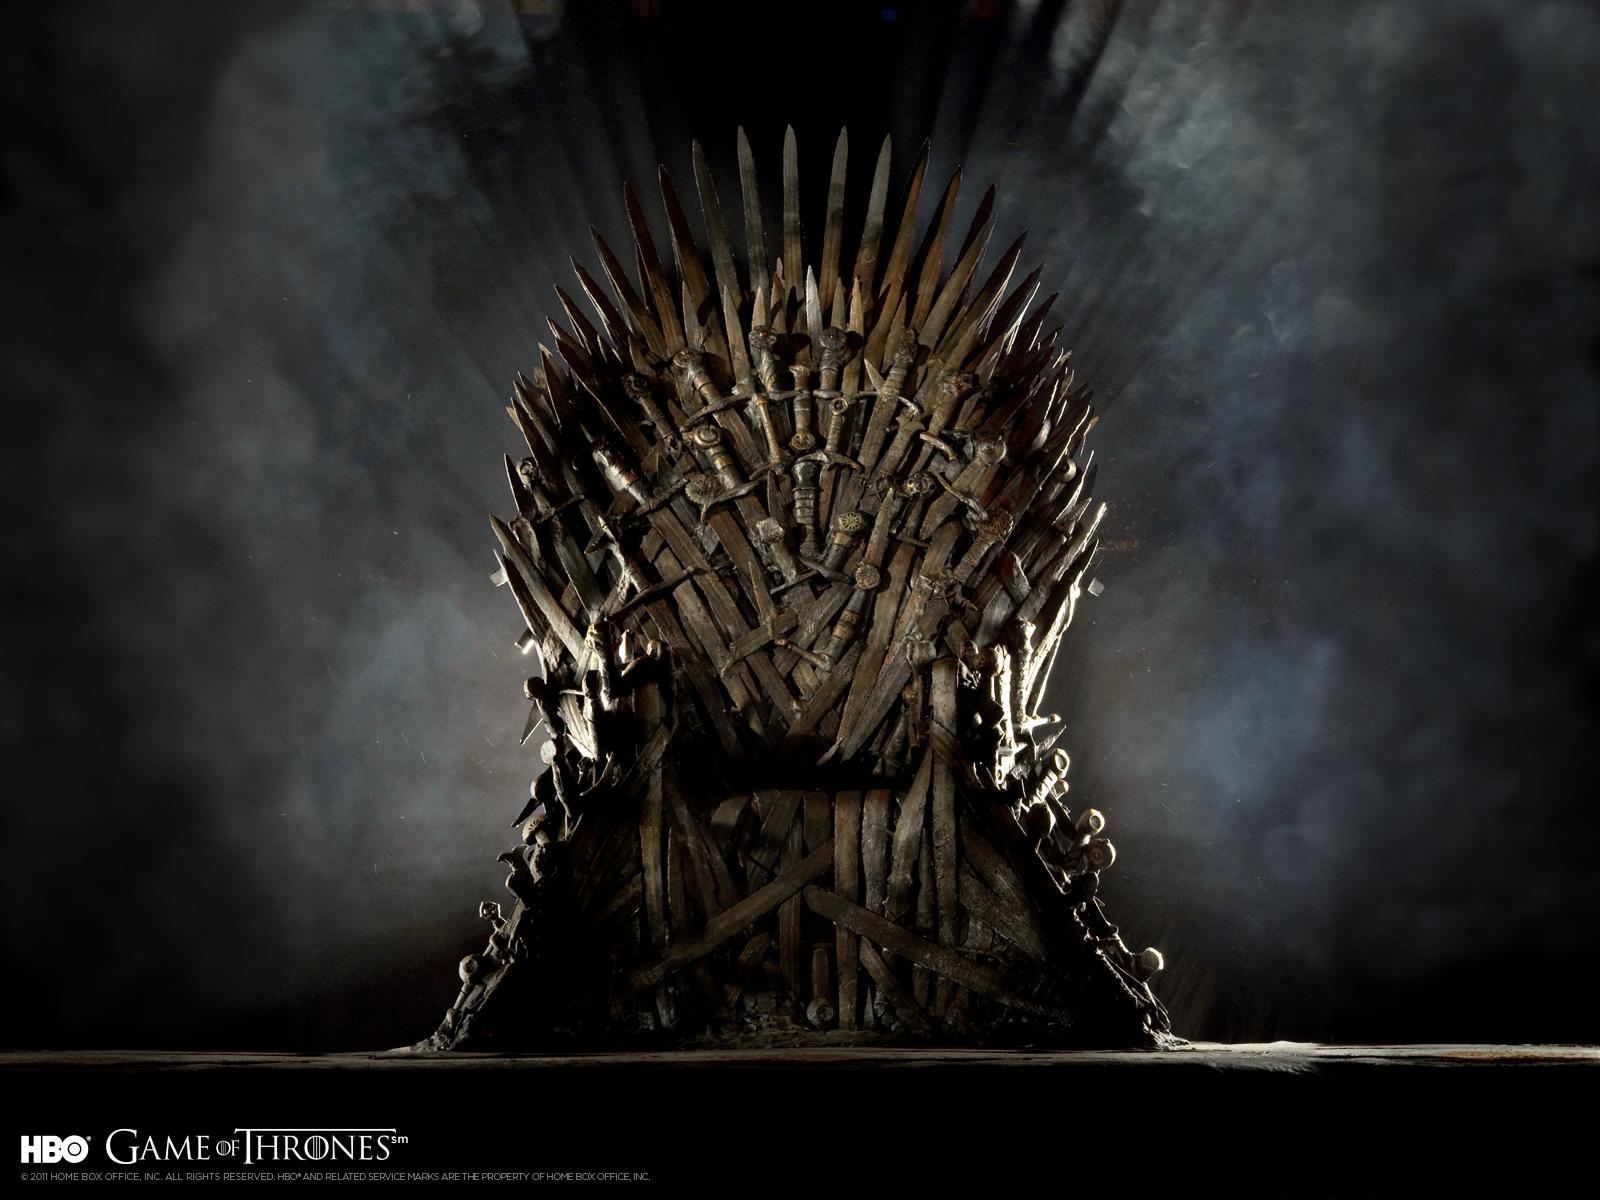 Game-of-Thrones-Wallpapers-13.jpg